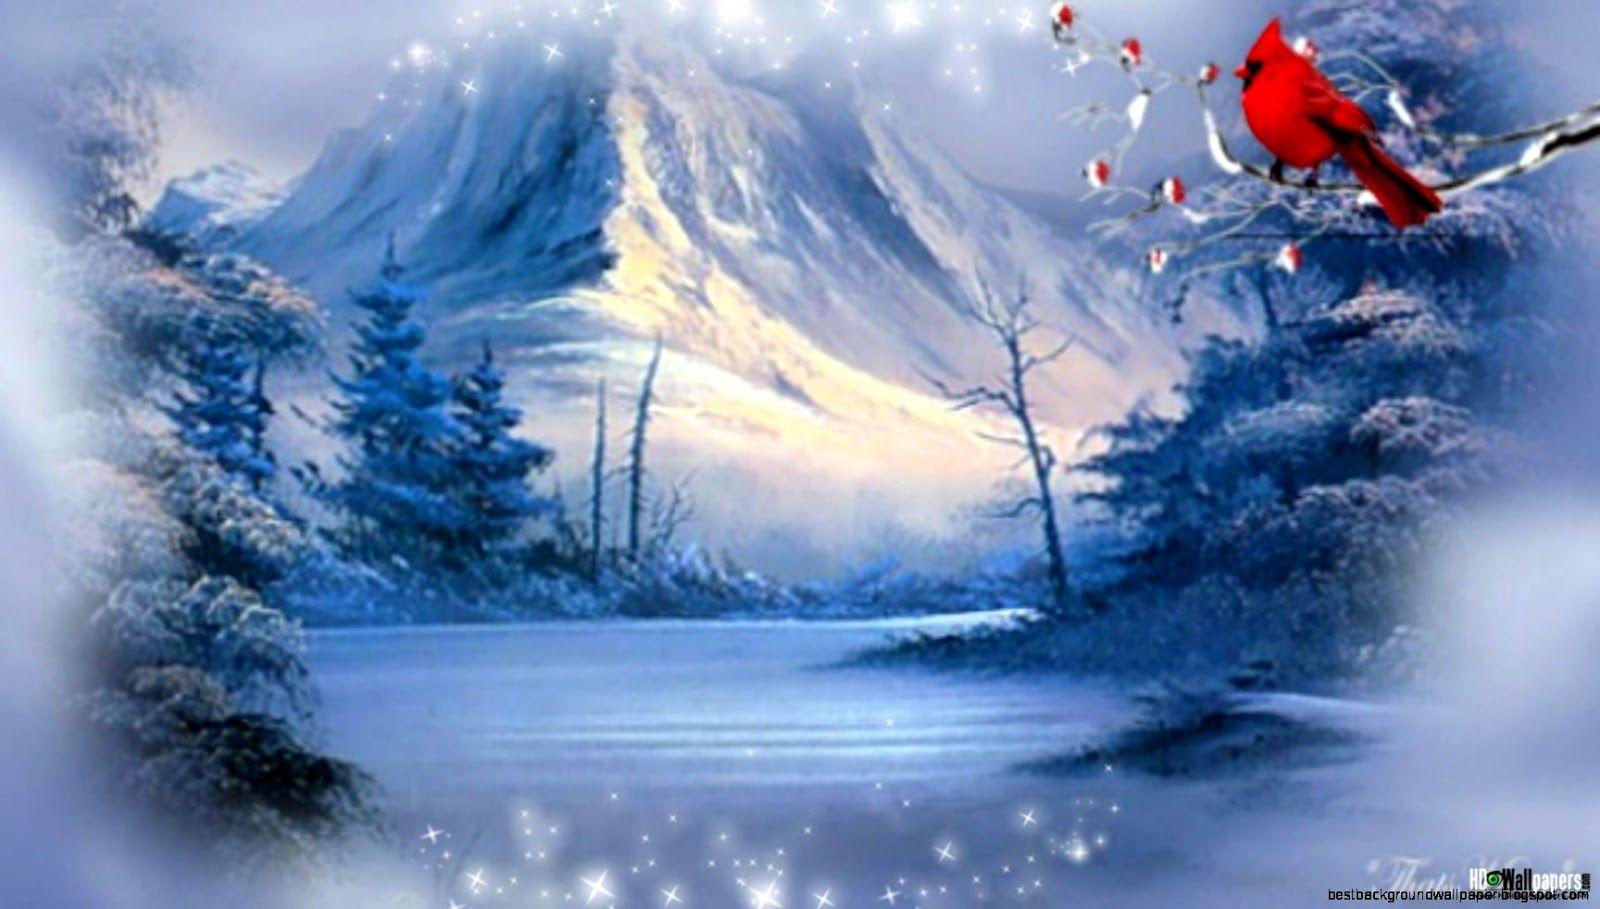 Winter Scenes For Desktop Winter Hd Wallpaper Best Background Wallpaper Free Winter Wallpaper Winter Wallpaper Winter Desktop Background